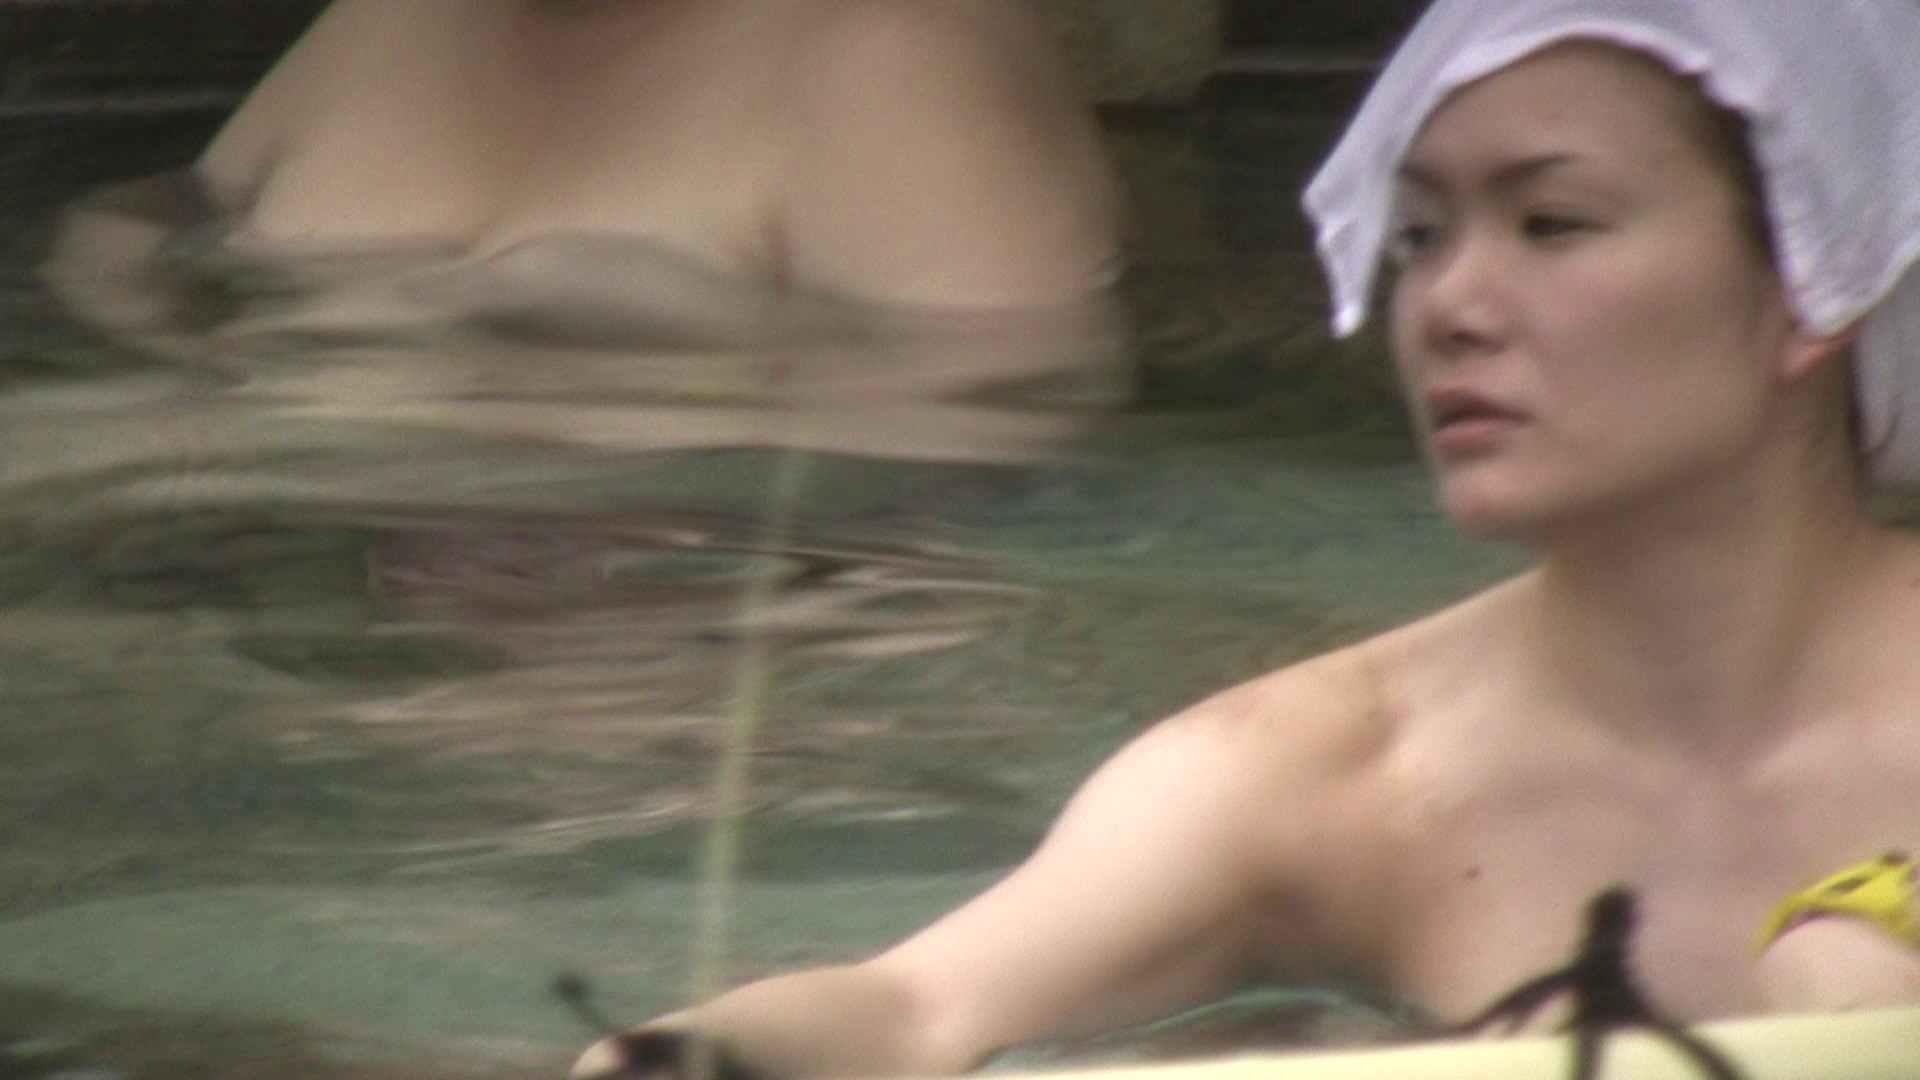 Aquaな露天風呂Vol.12【VIP】 綺麗なOLたち | 盗撮  84枚 34